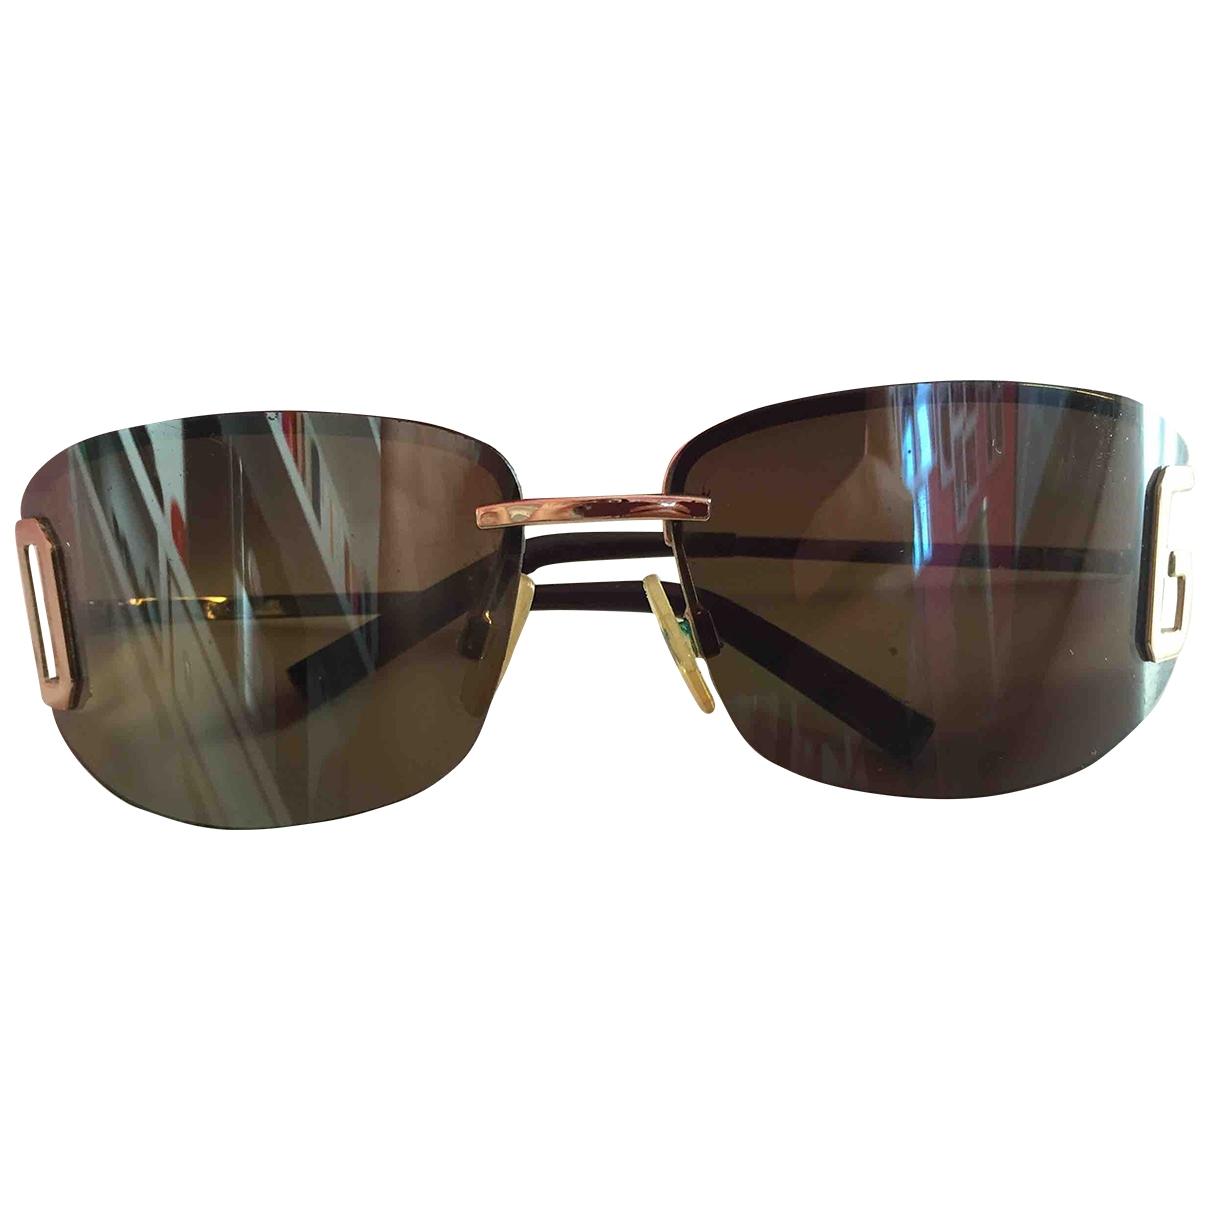 D&g \N Black Metal Sunglasses for Women \N